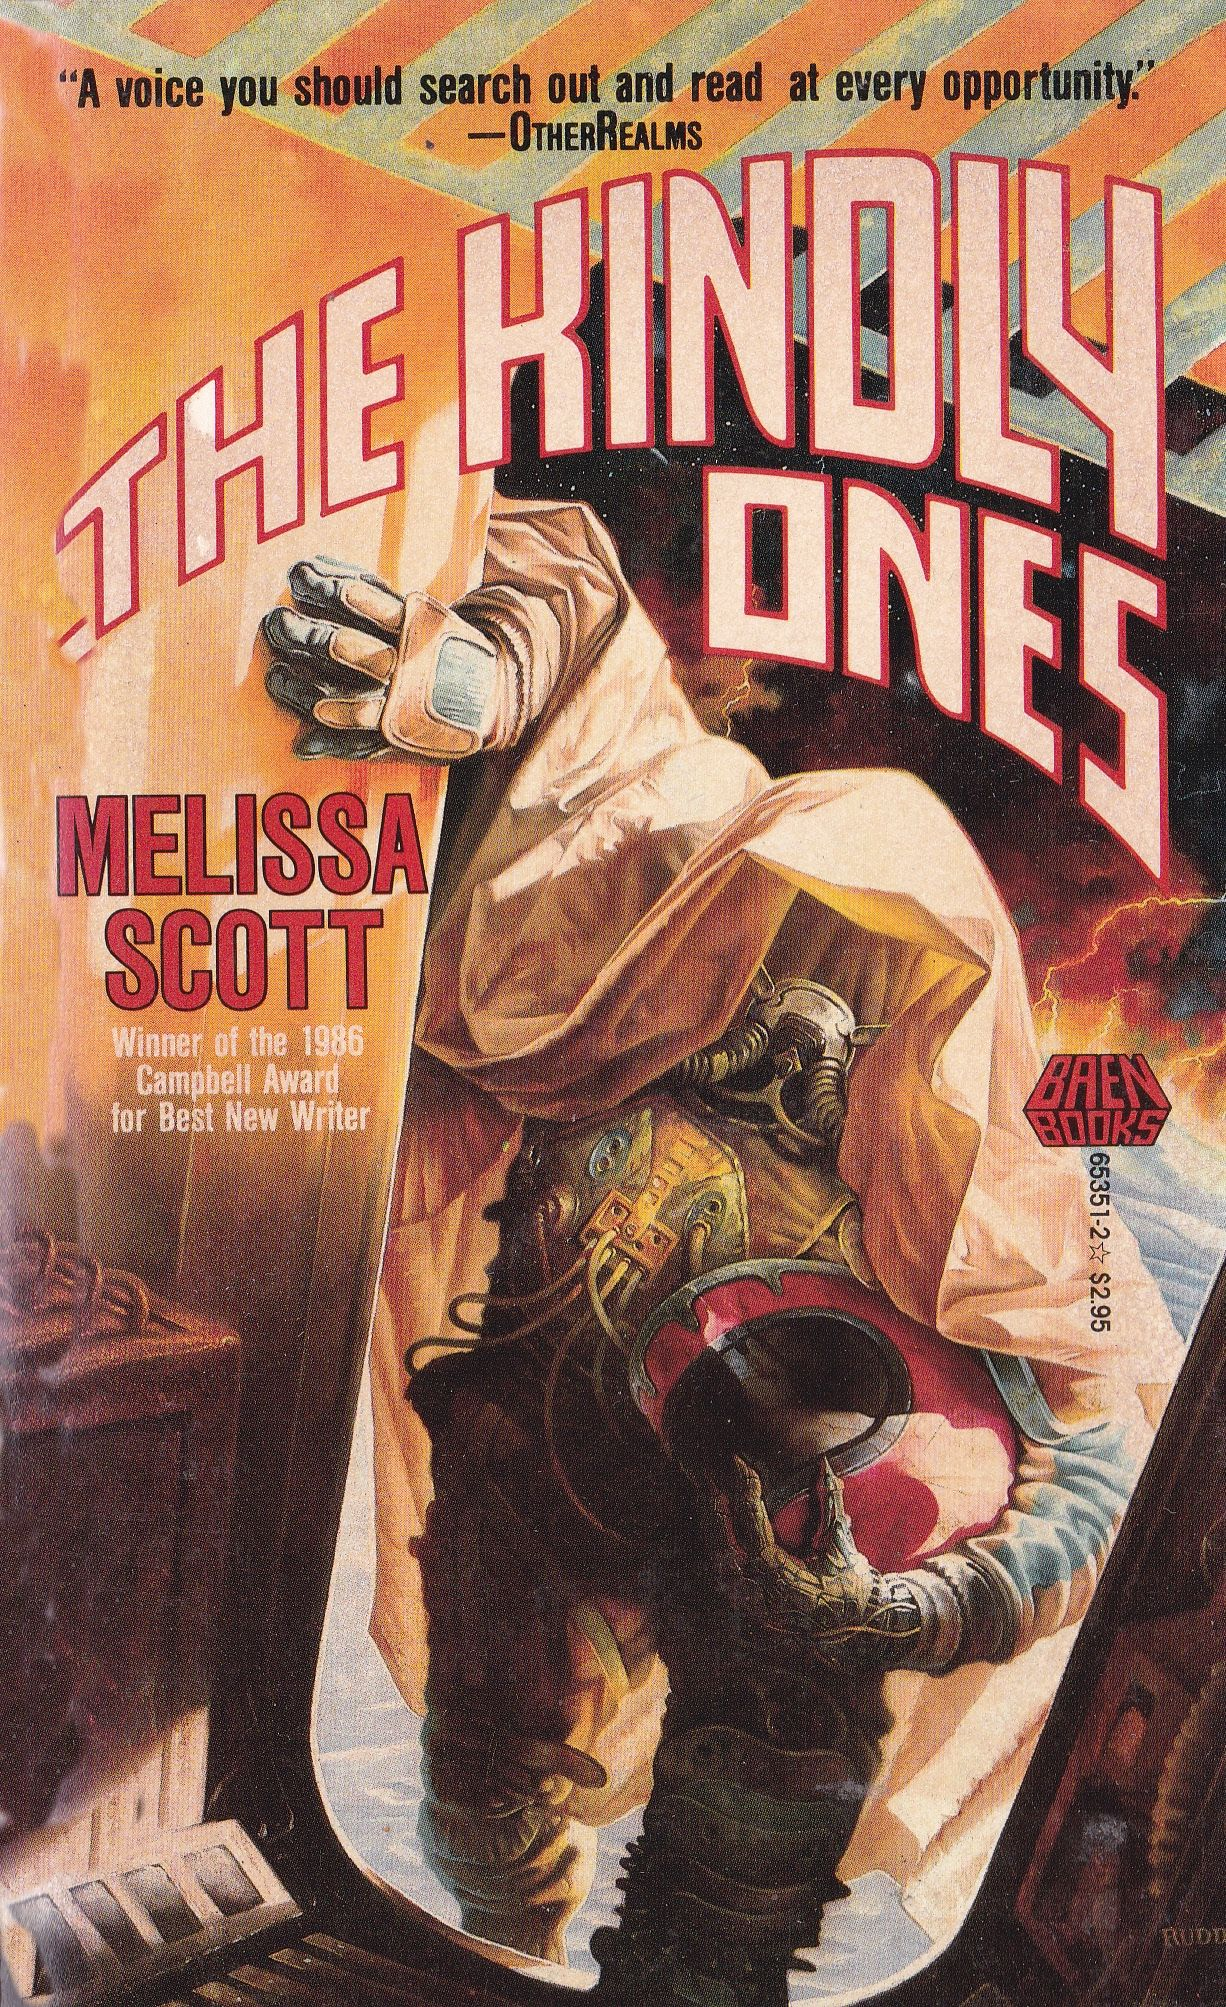 Melissa Scott The Kindly Ones Pulp Fiction Art Pulp Novels Pulp Fiction